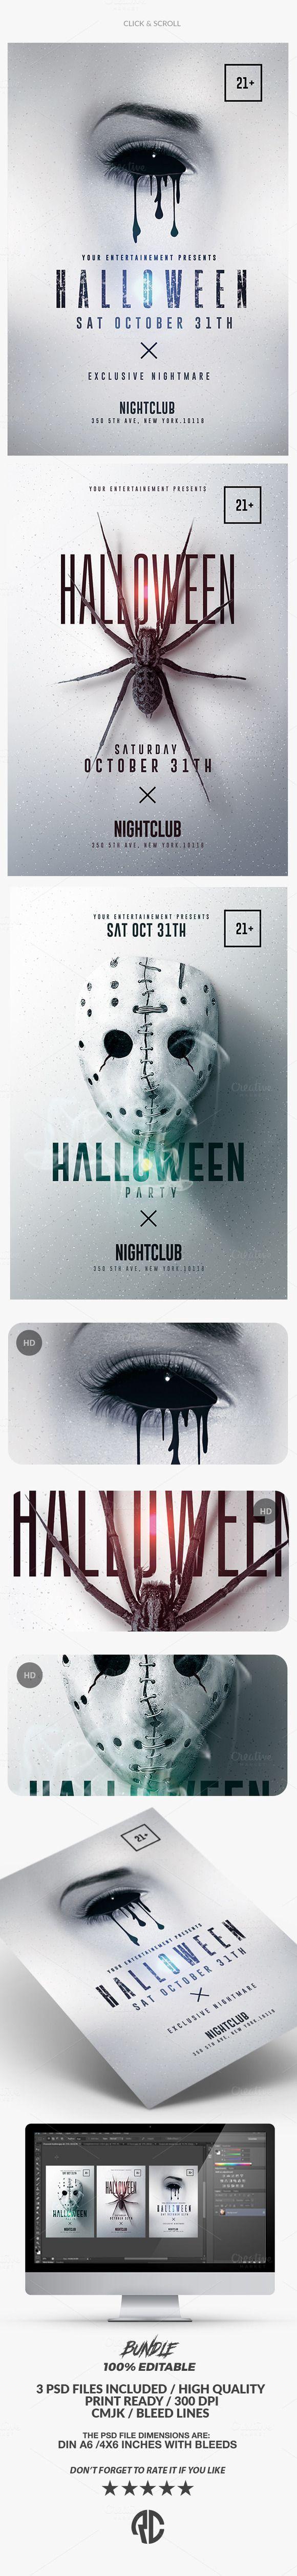 Best 25+ Halloween havoc ideas on Pinterest   DIY Halloween fog ...